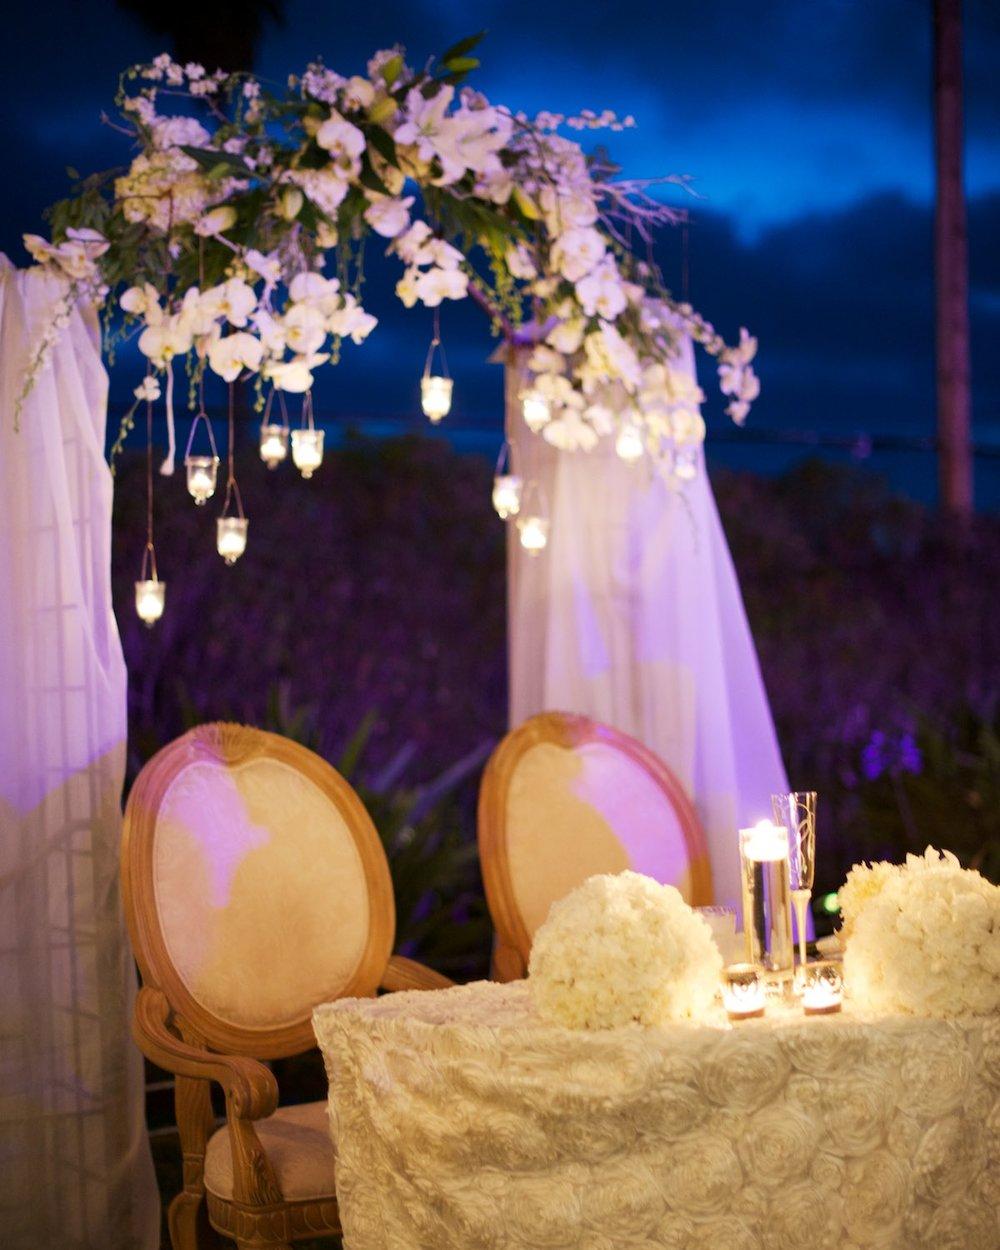 la-valencia-wedding-michal-pfeil-46.jpg